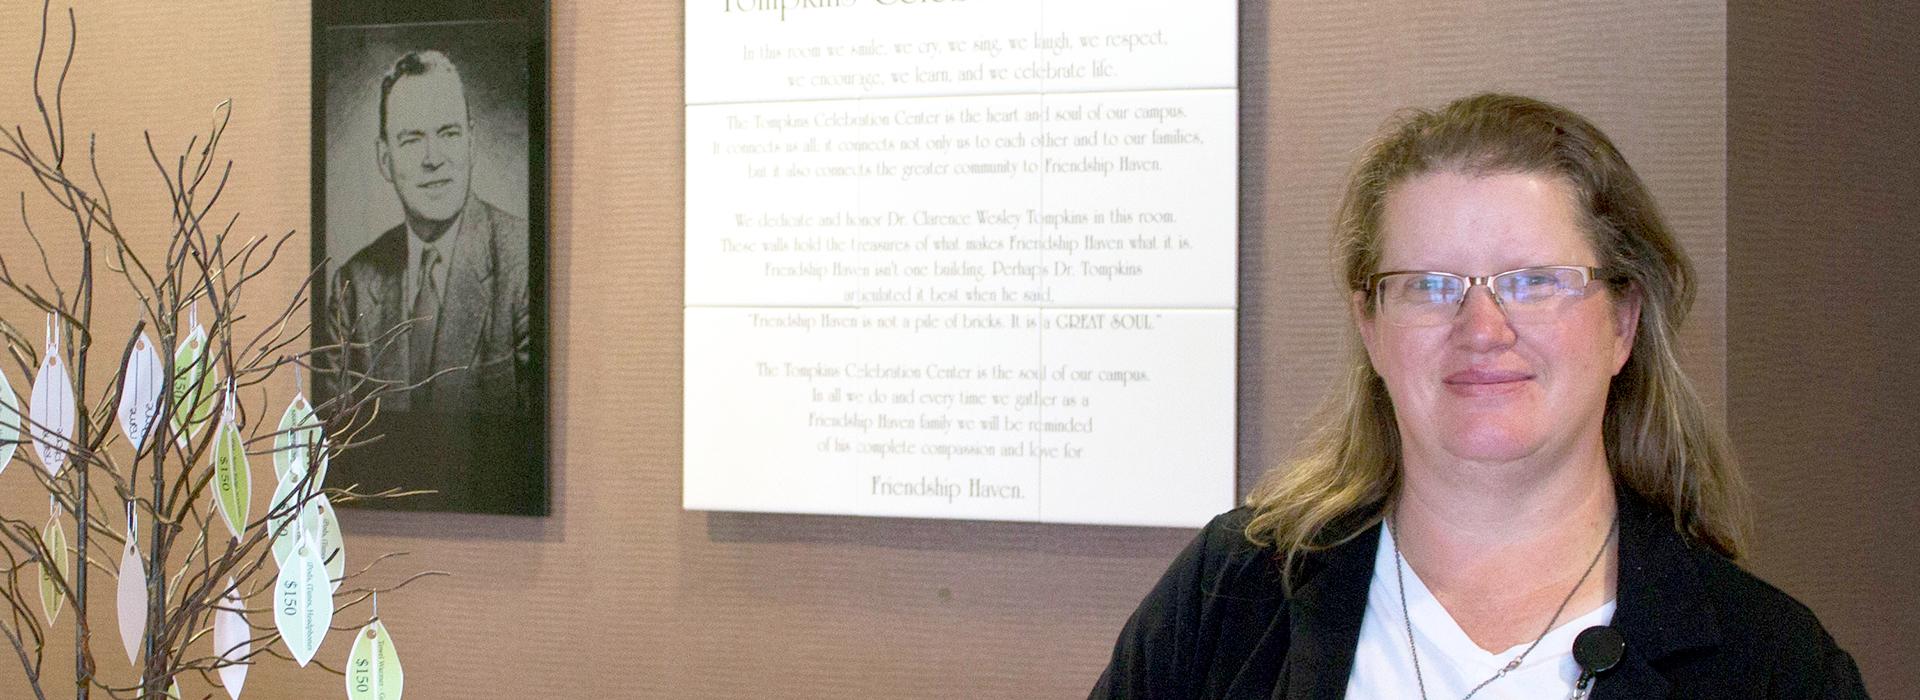 Get to Know: Pastor Jennifer, Friendship Haven's Spiritual Care Coordinator